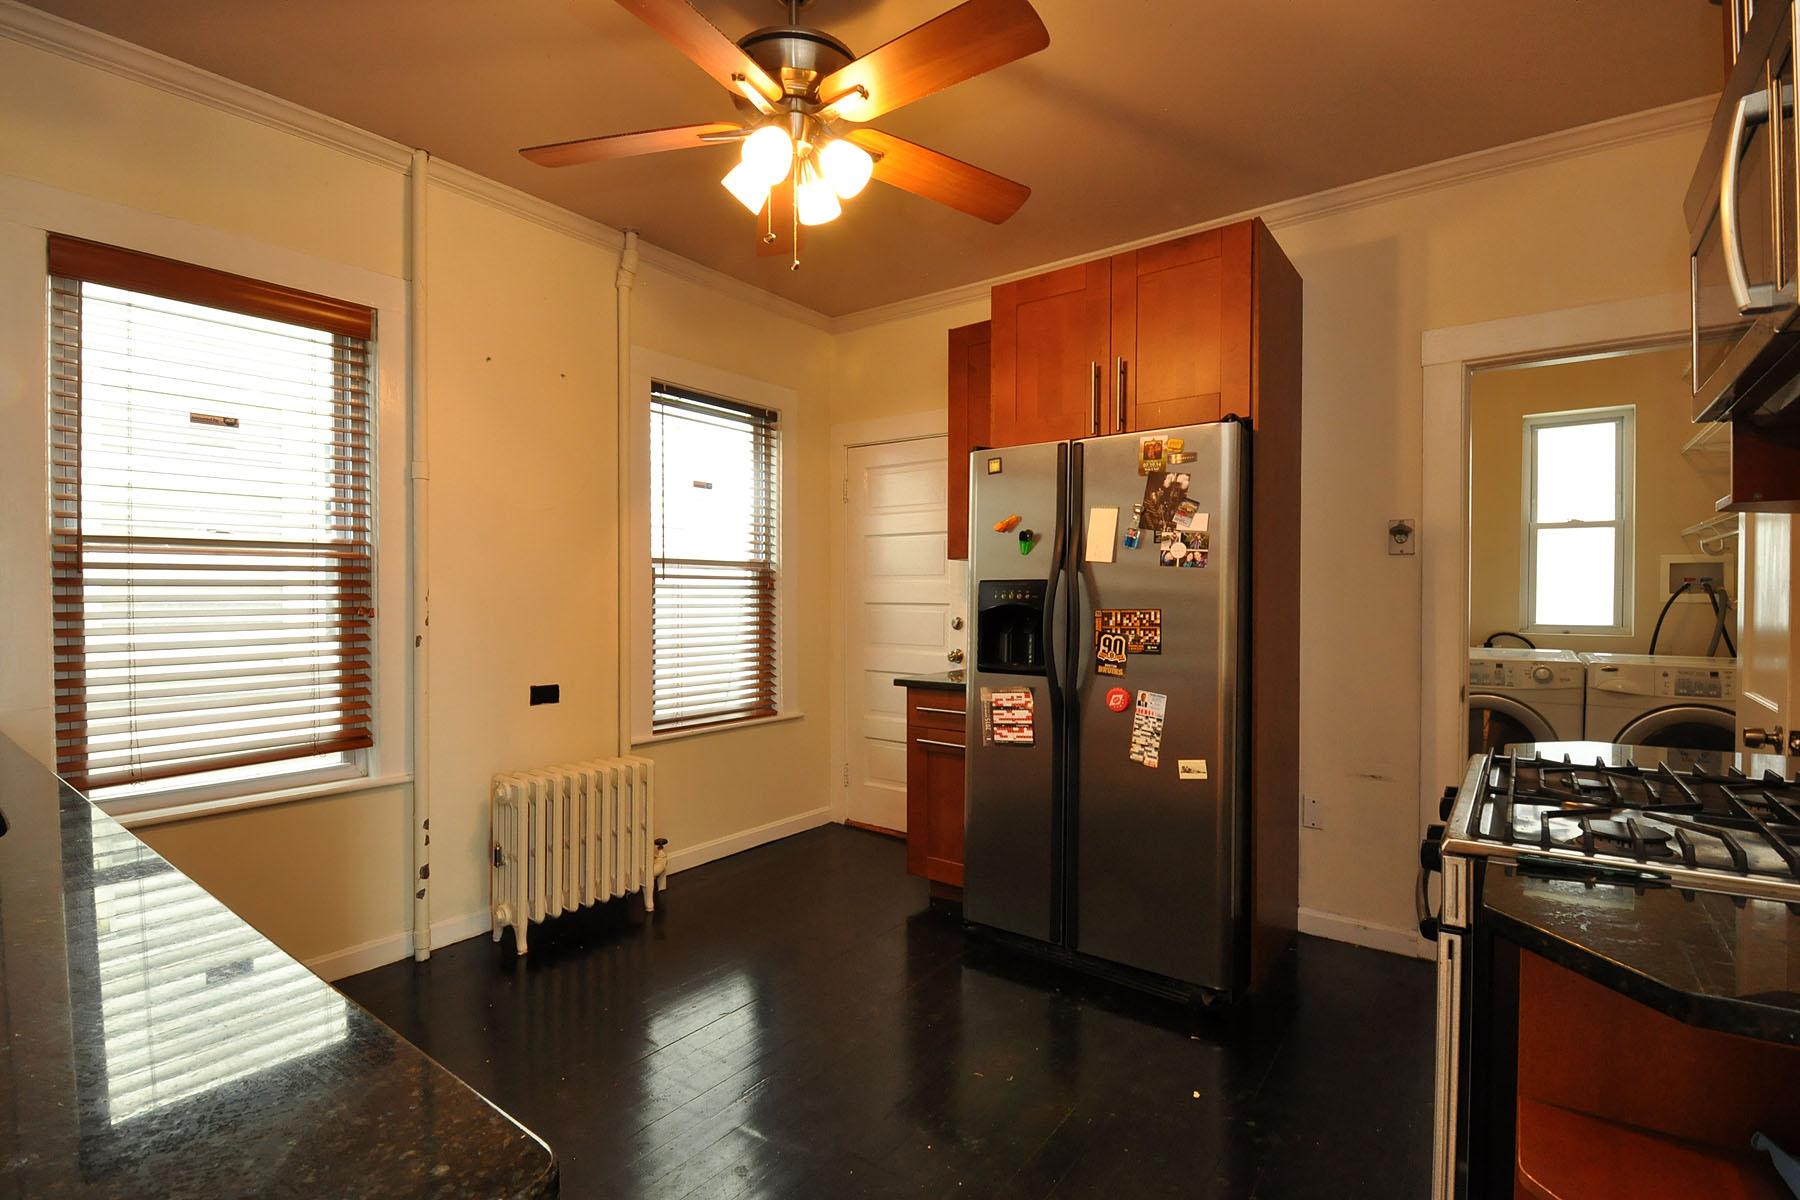 Condominium for Sale at Gorgeous Savin Hill Condo 175 Savin Hill Avenue Unit 1 Boston, Massachusetts 02125 United States